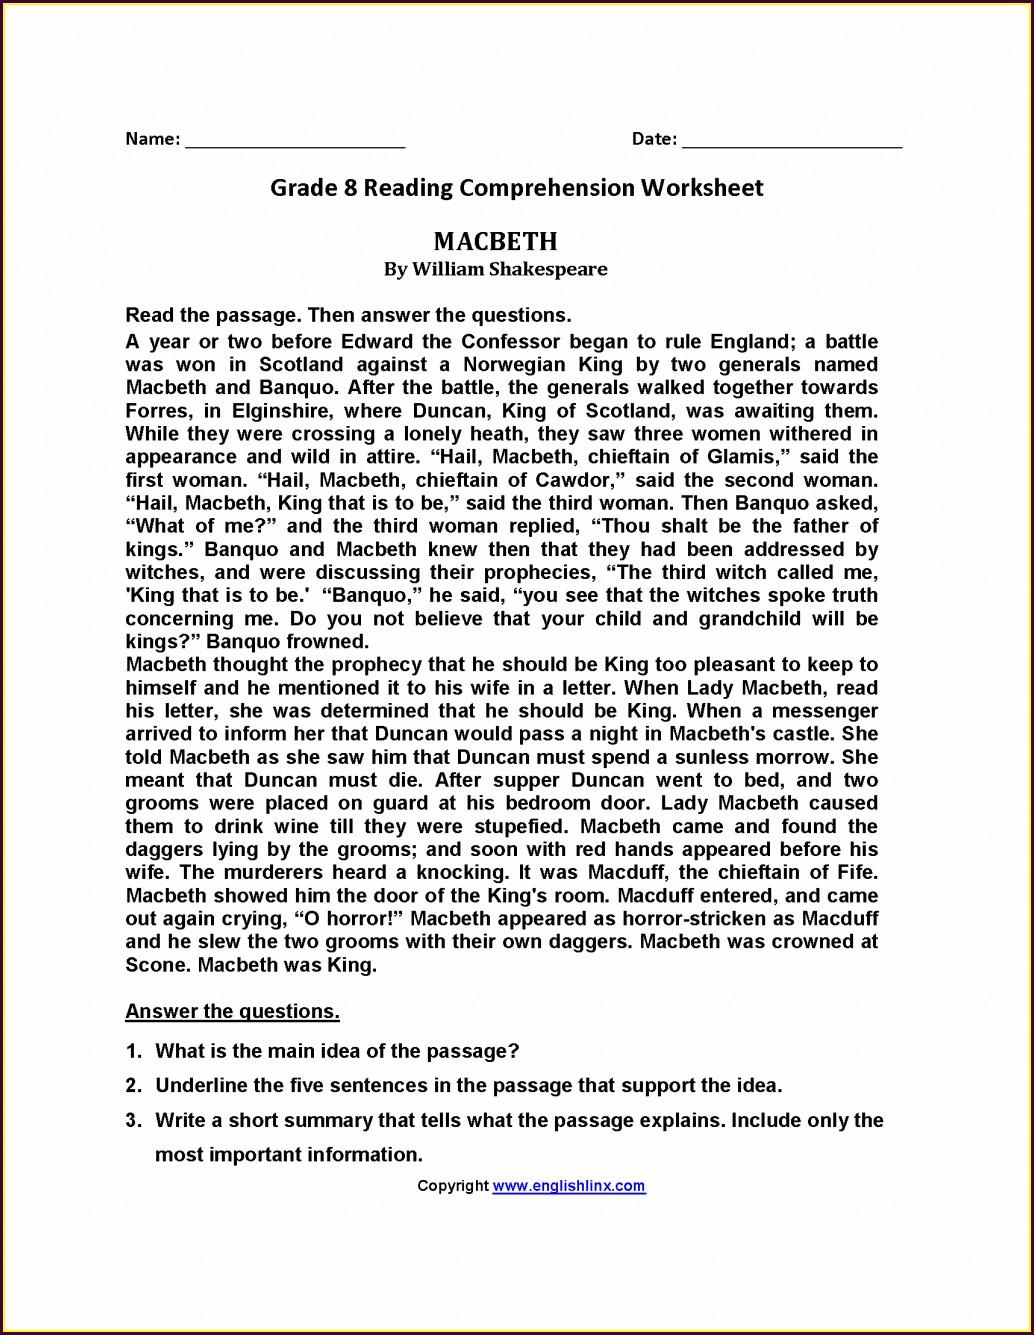 8th Grade Reading Worksheet